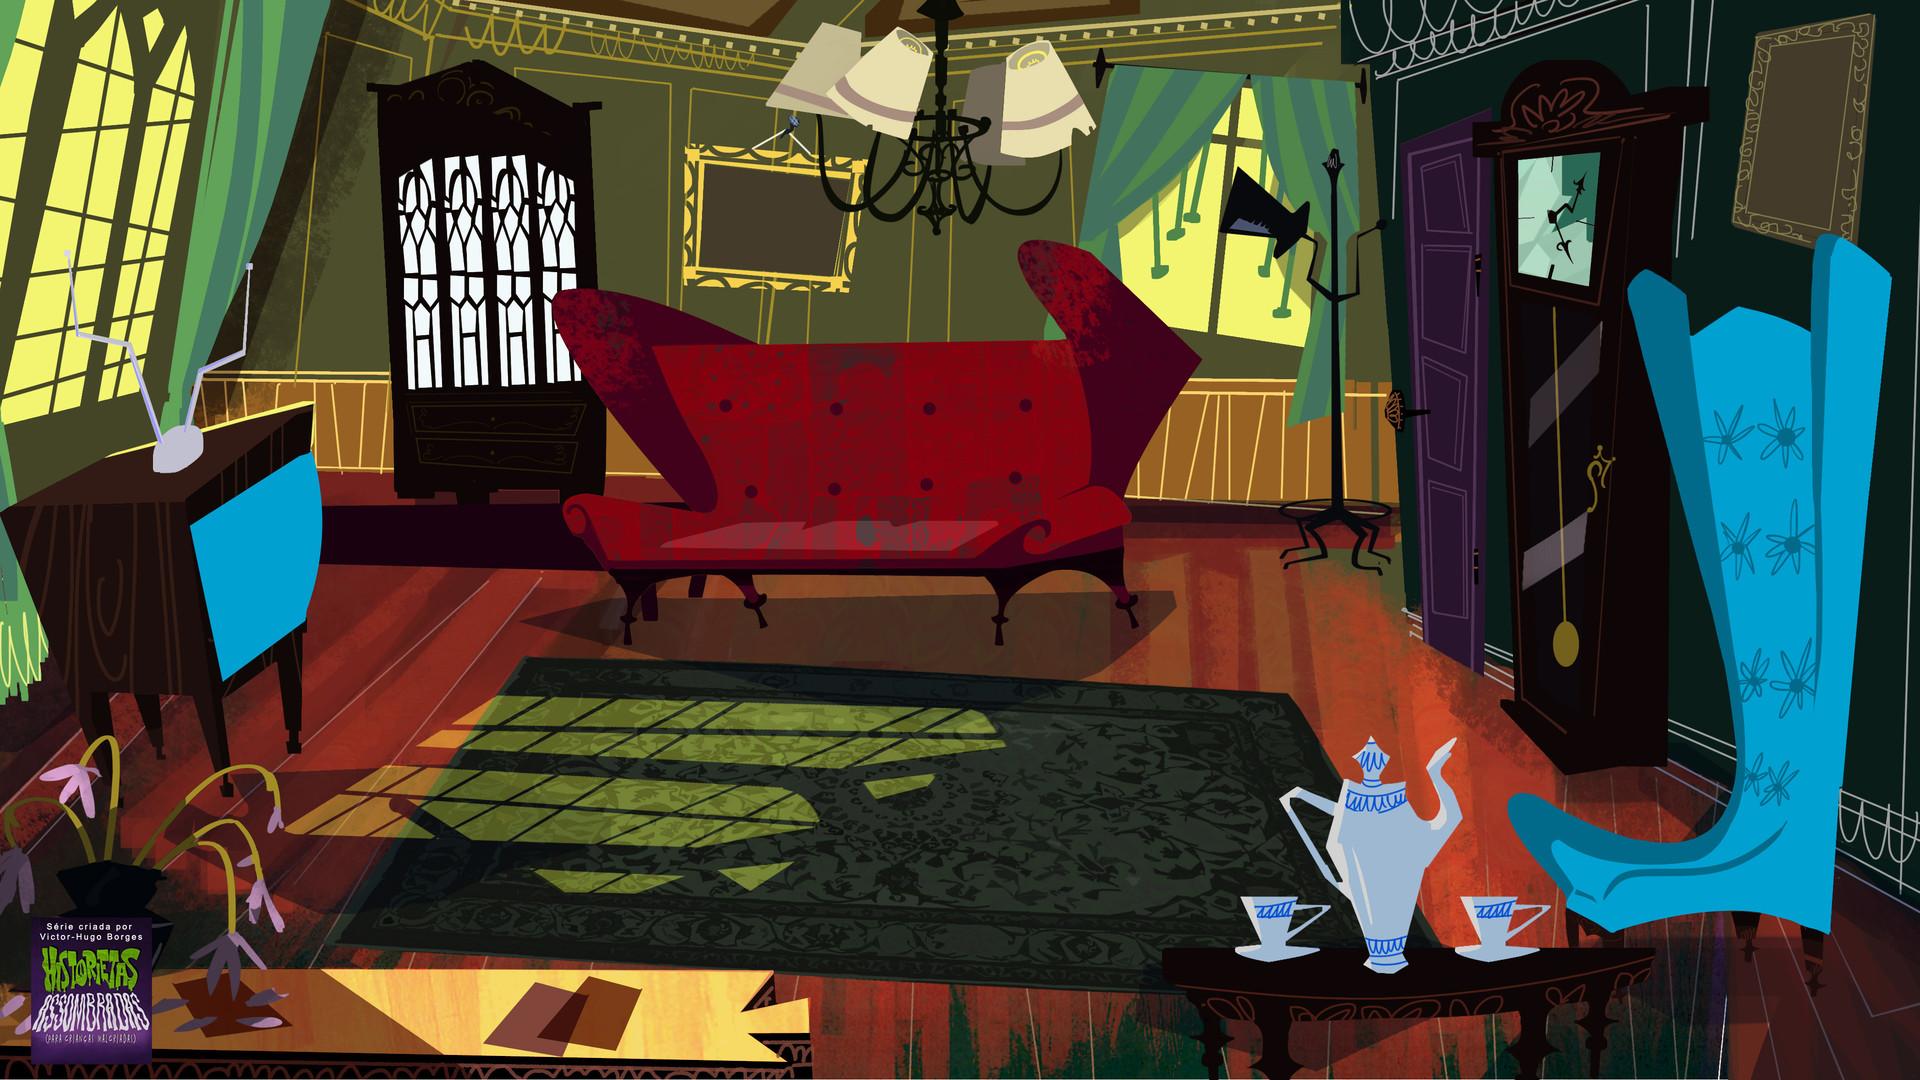 ArtStation - Haunted Tales for Wicked Kids   Cartoon ...